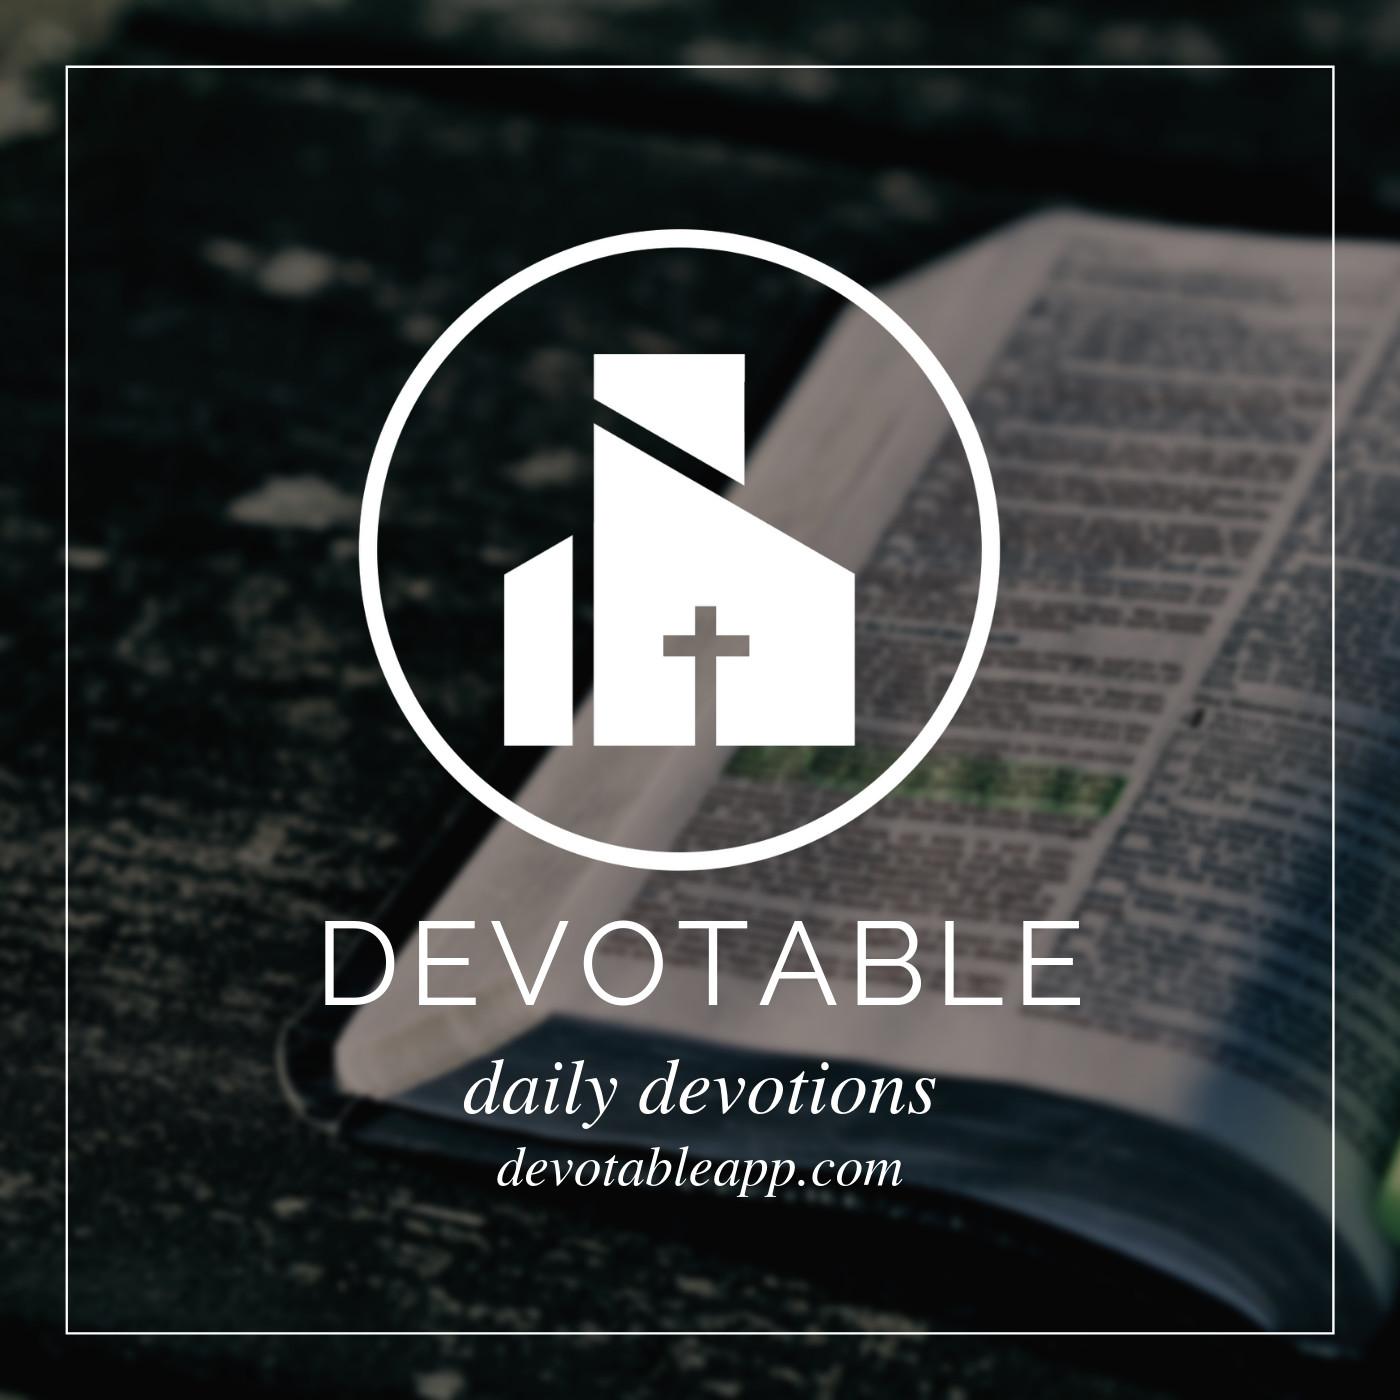 Daily Devotion - Episode 278 - Having a Gentle and Quiet Spirit